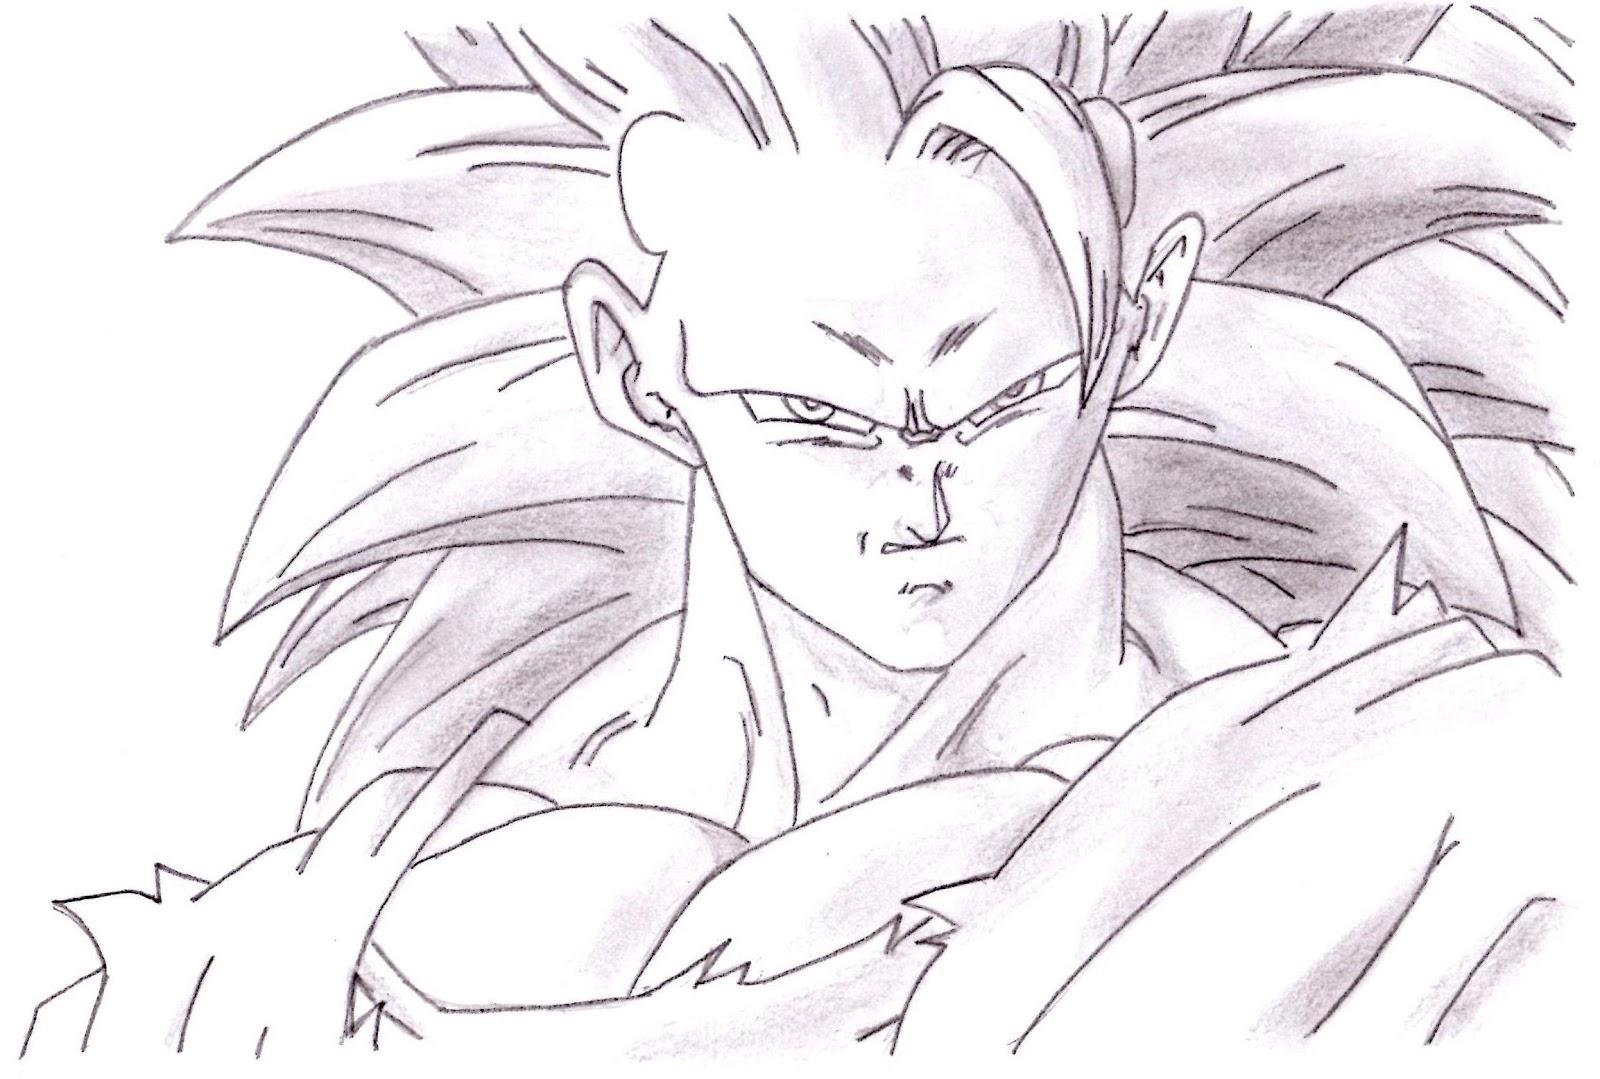 Imagenesde99 Imagenes De Goku Para Dibujar A Lapiz Faciles